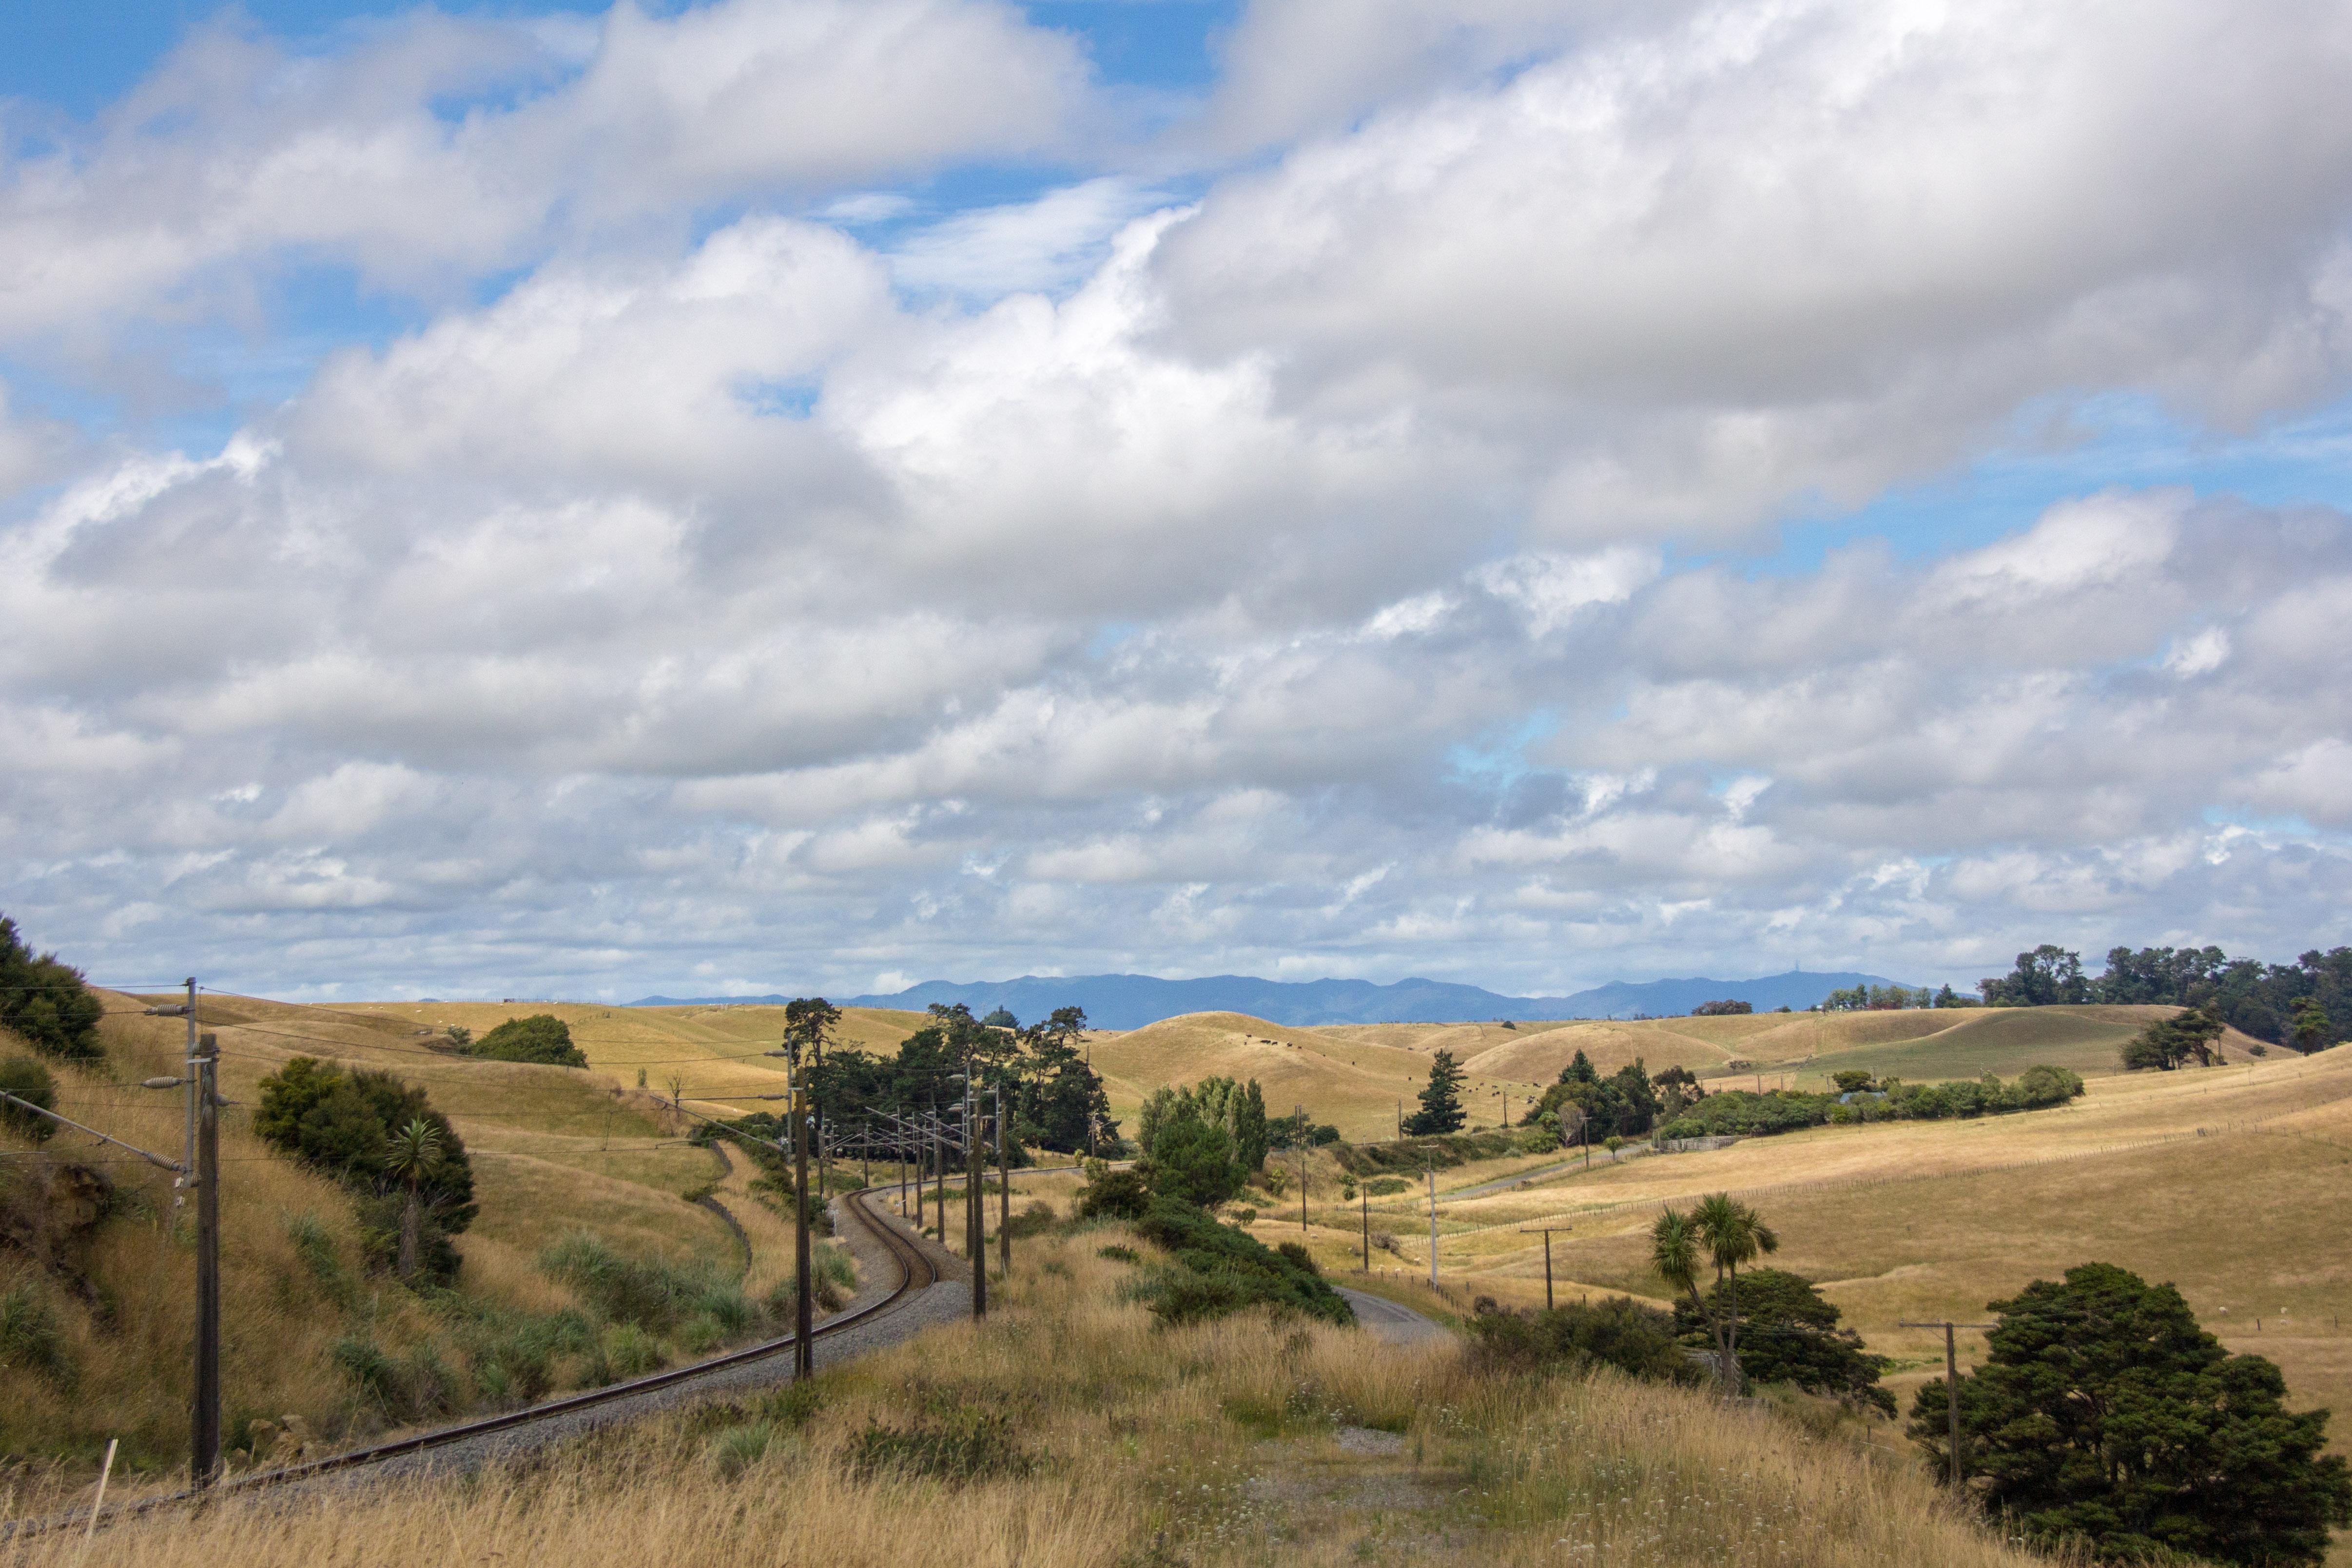 Manawatu Rail line